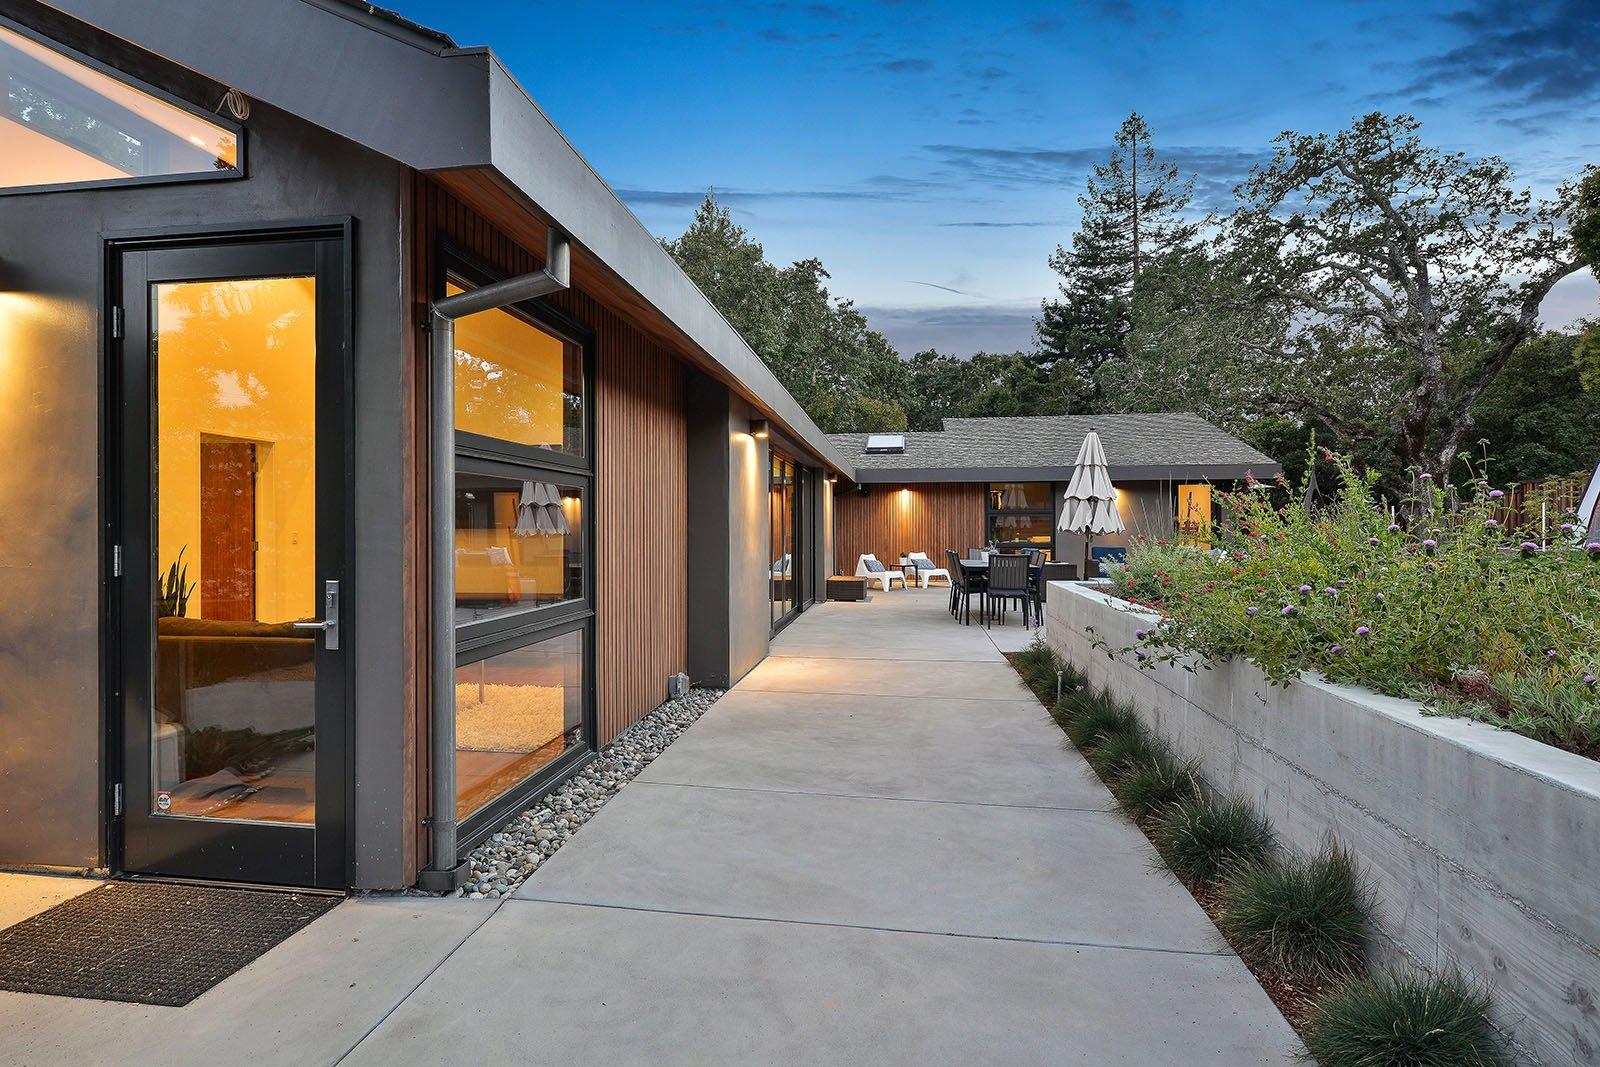 Outdoor, Back Yard, Concrete Patio, Porch, Deck, and Walkways Rear yard   Portola Valley by patrick perez/designpad architecture